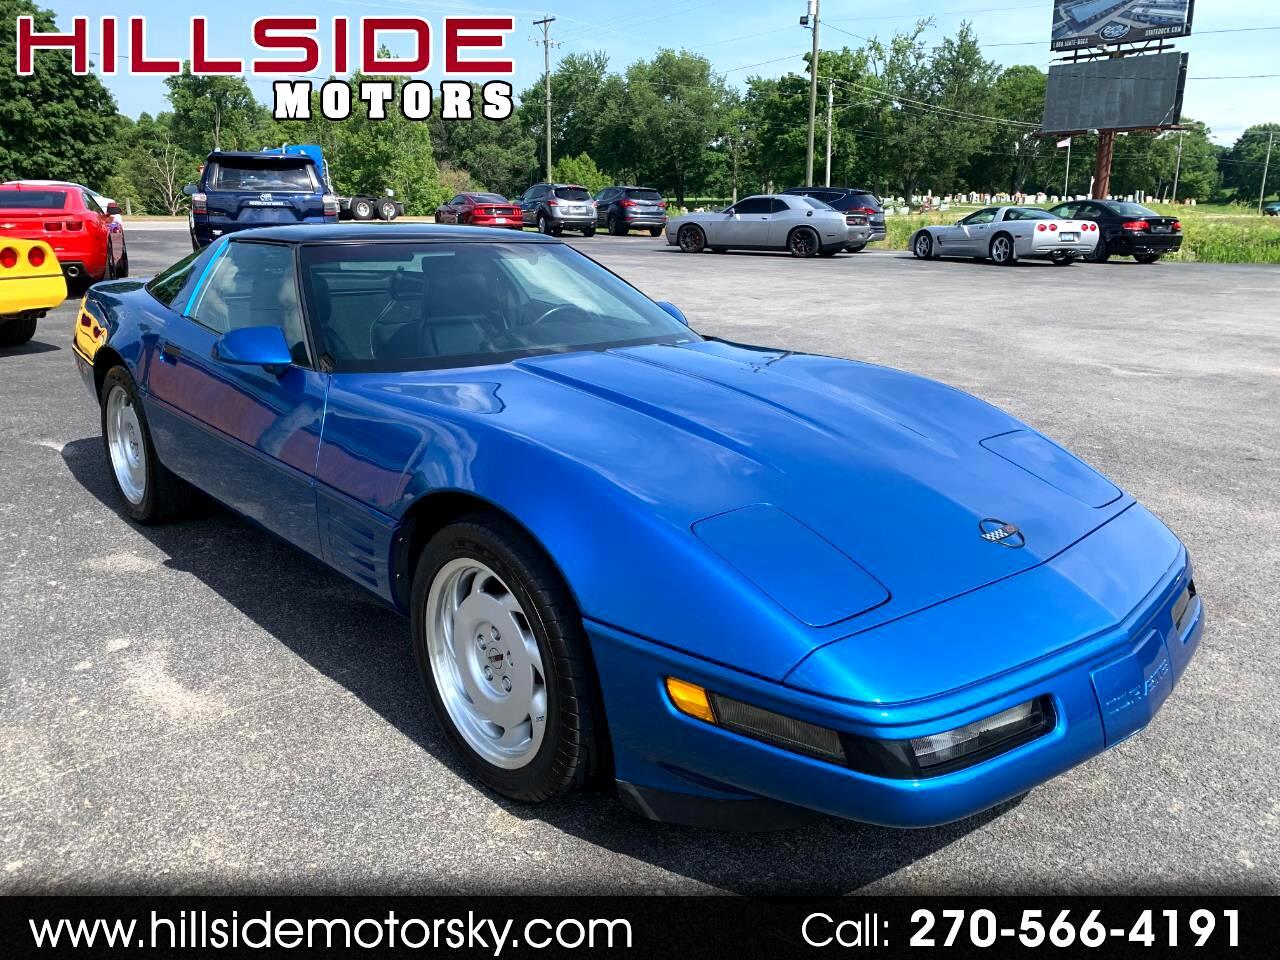 Chevrolet Corvette 2dr Coupe Hatchback 1992